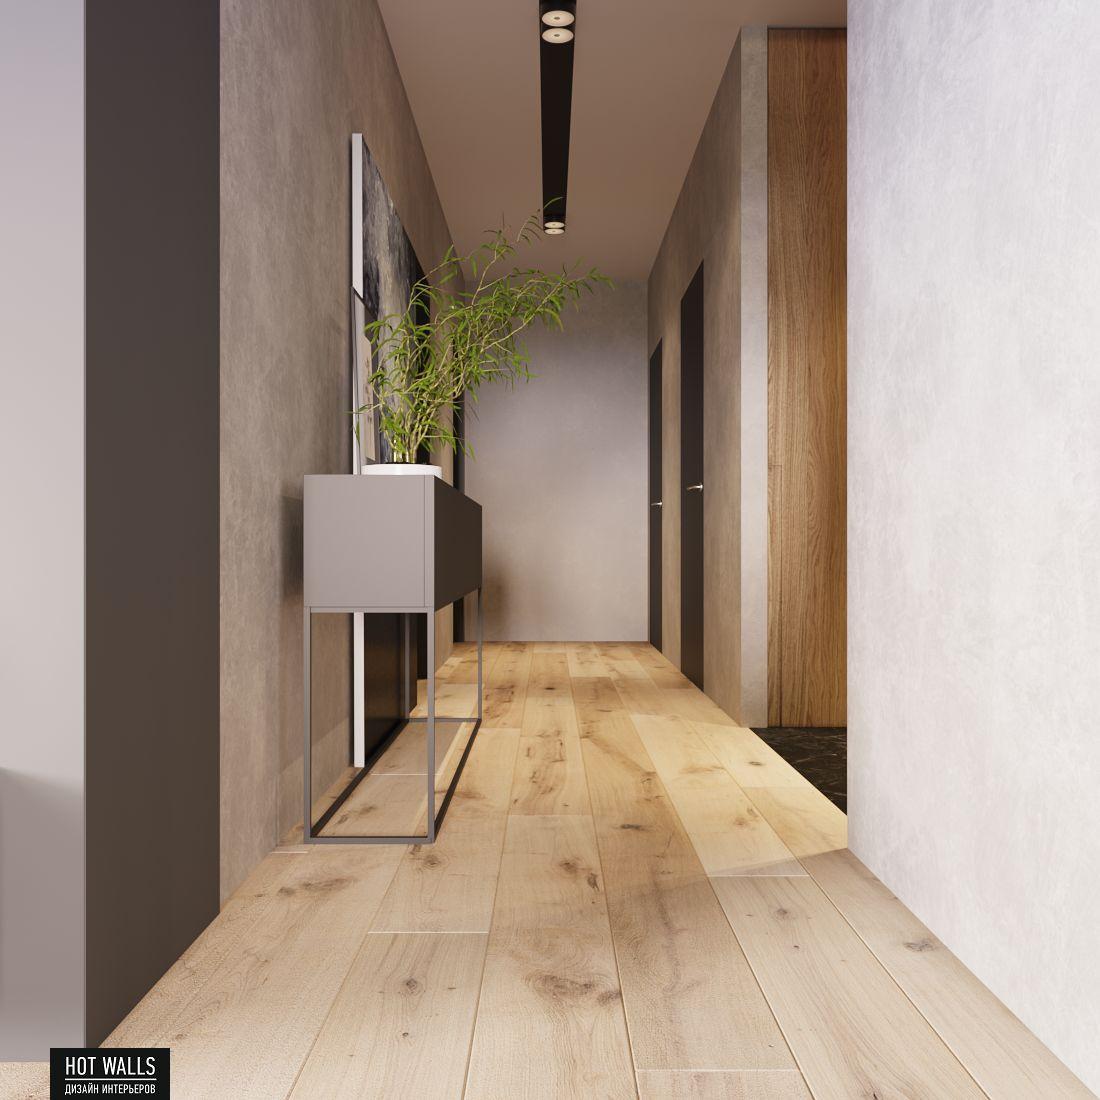 Hallway_27.06.17_3